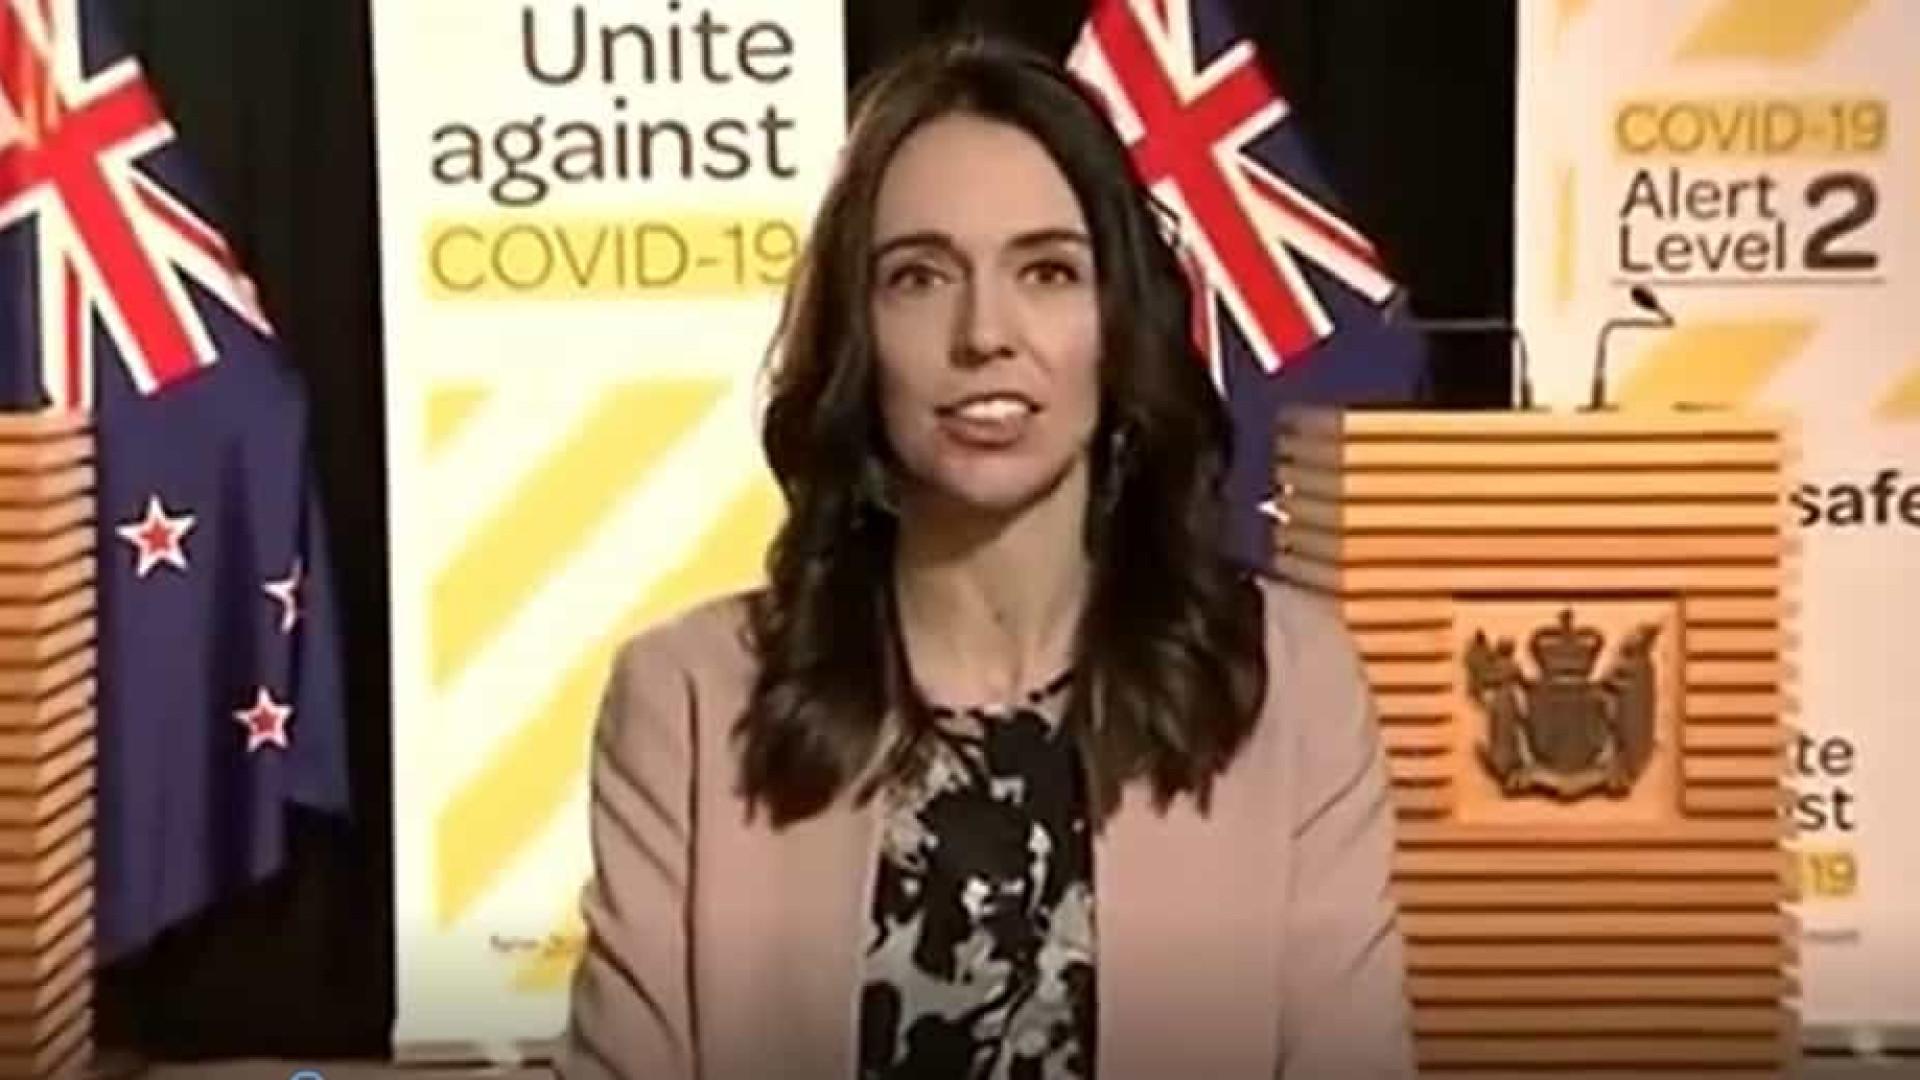 Terremoto surpreende premiê da Nova Zelândia durante entrevista